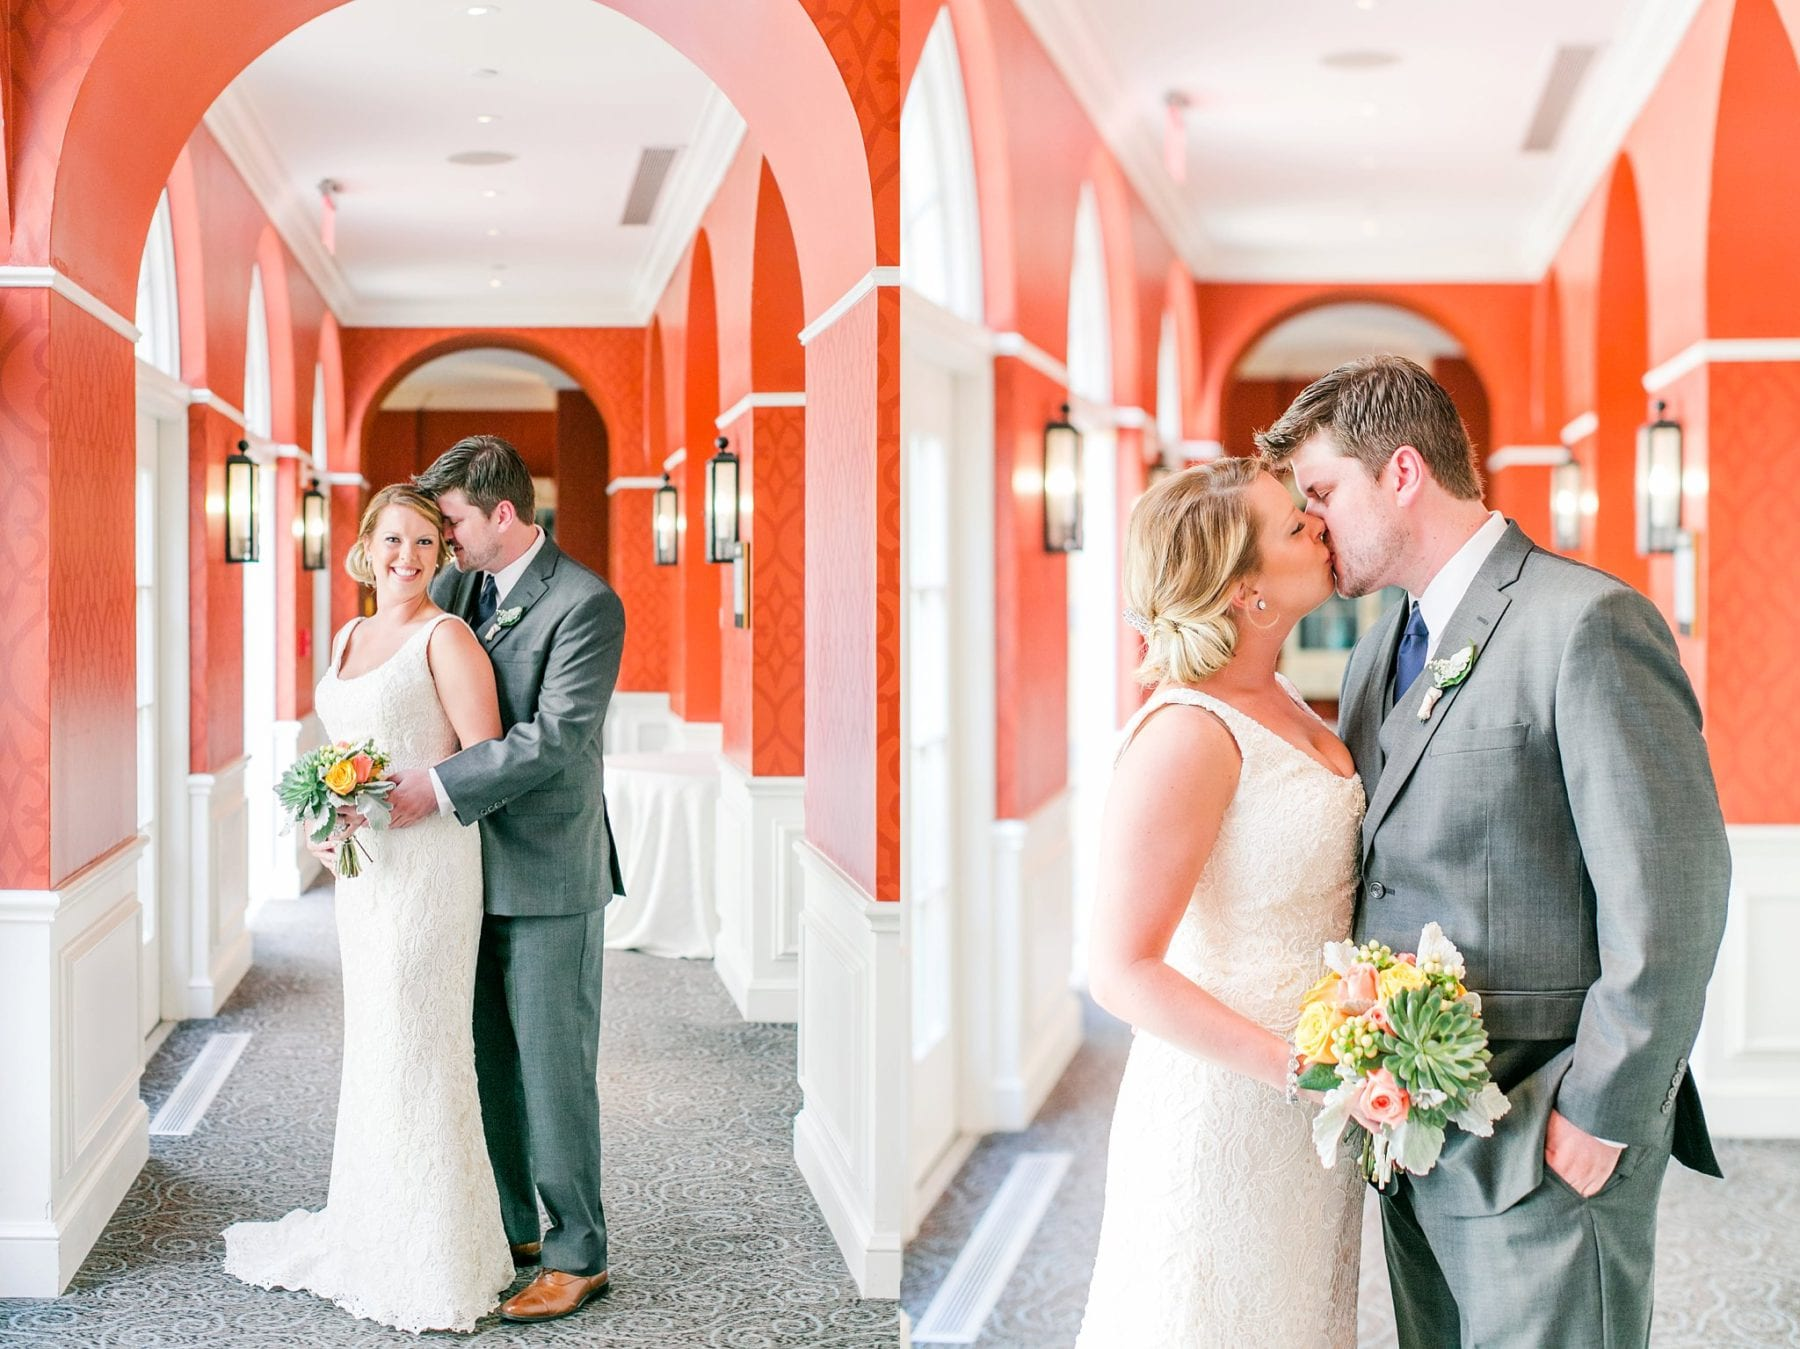 Hotel Monaco Wedding Photos Virginia Wedding Photographer Megan Kelsey Photography Kevin & Morgan-150.JPG